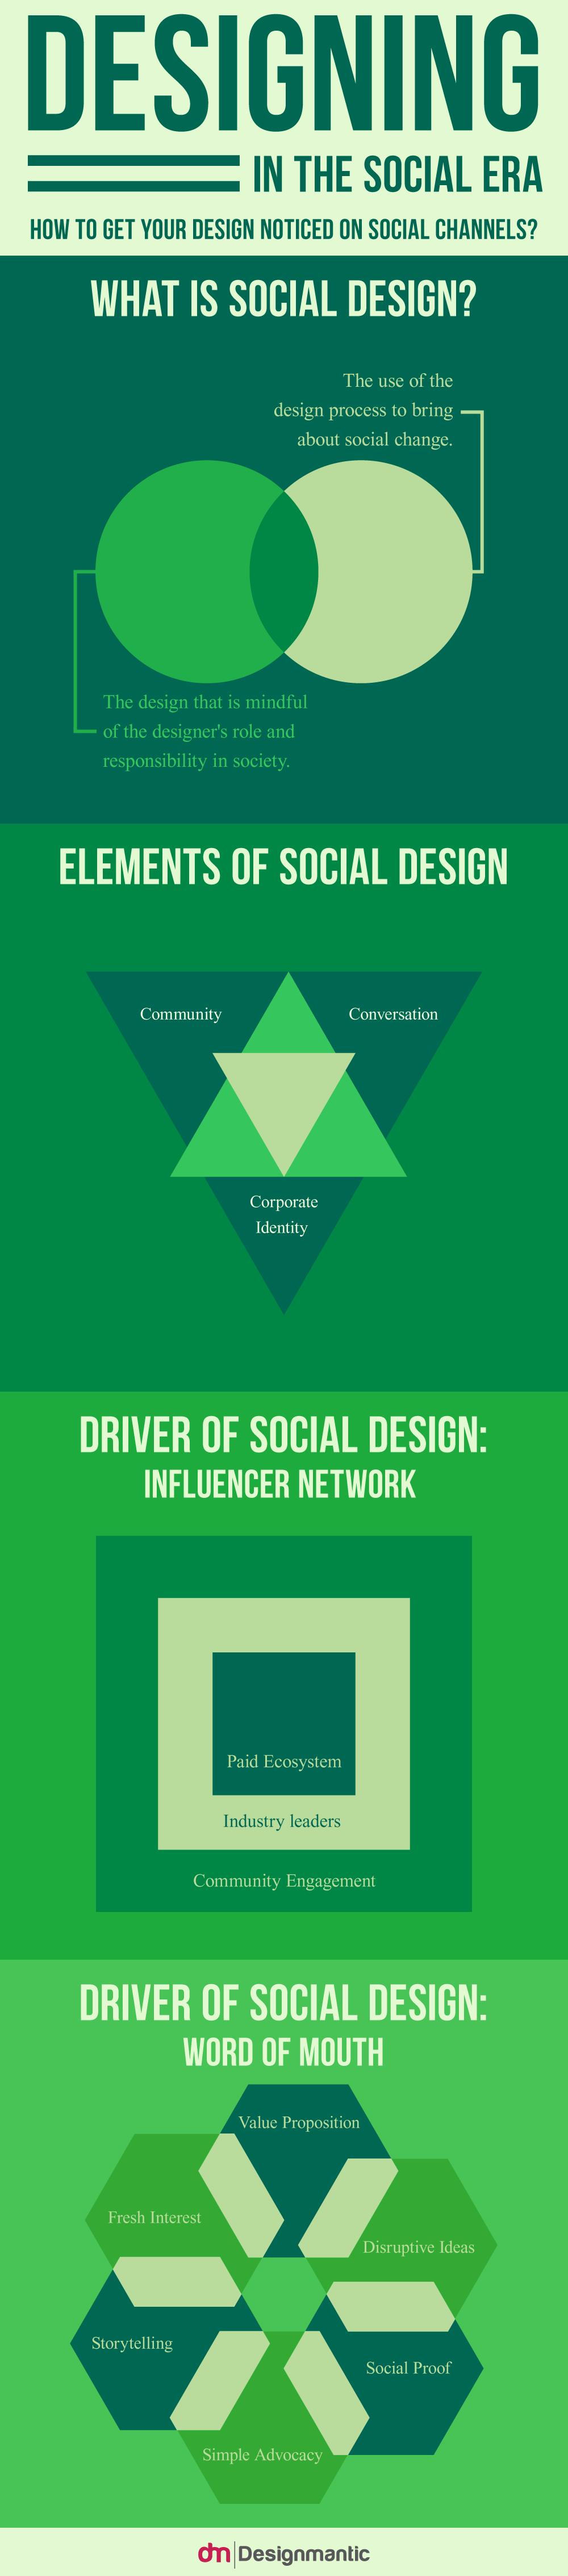 Designing In The Social Era